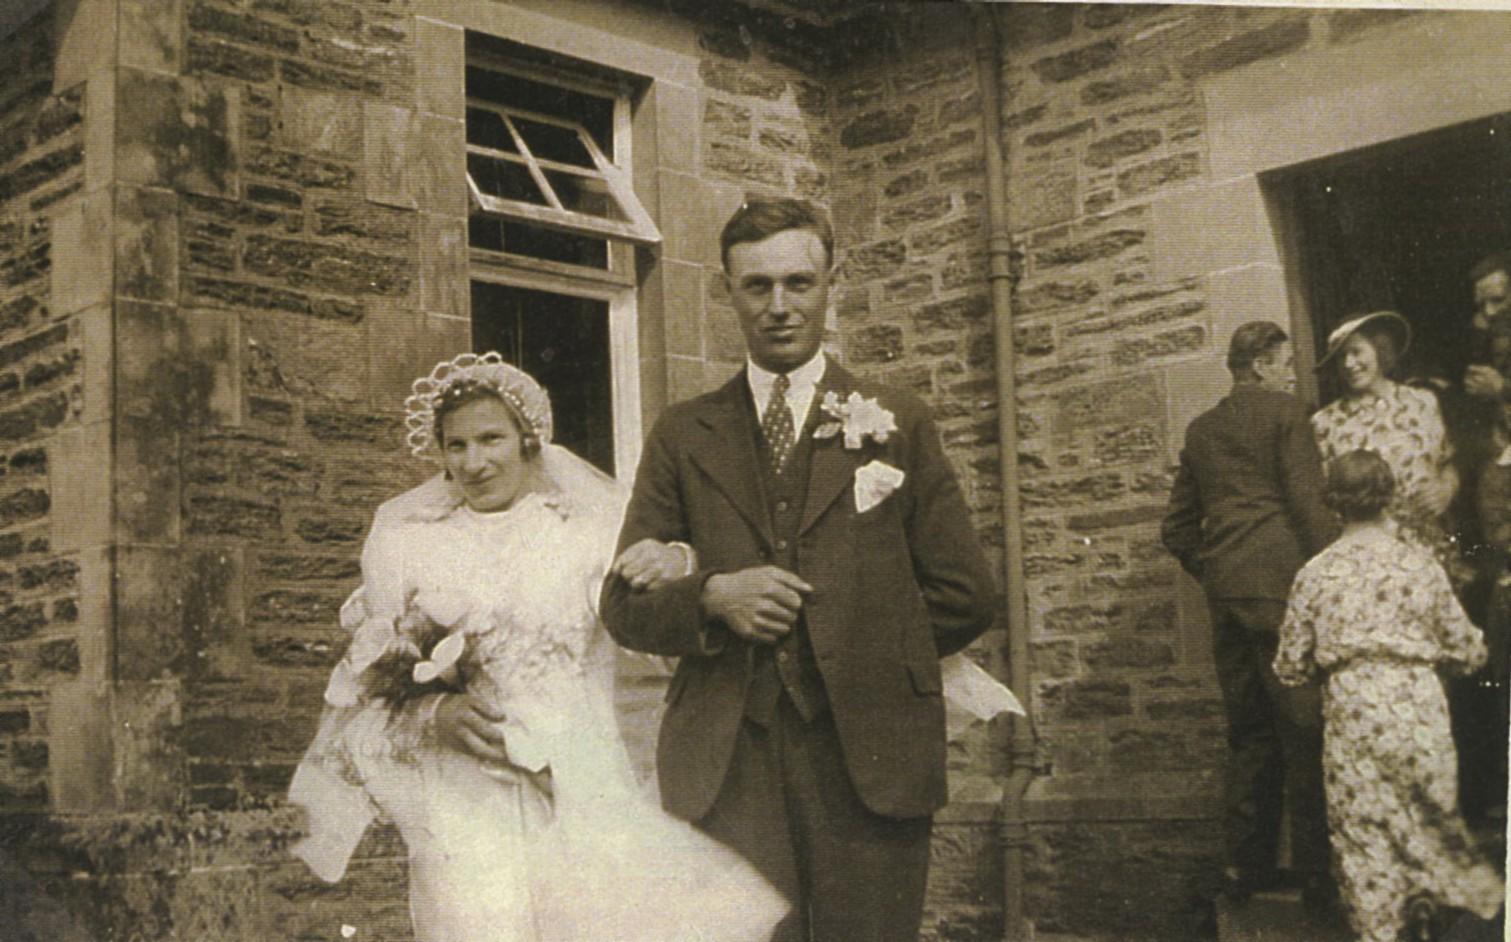 Nellie McNair & John Shaw's Wedding